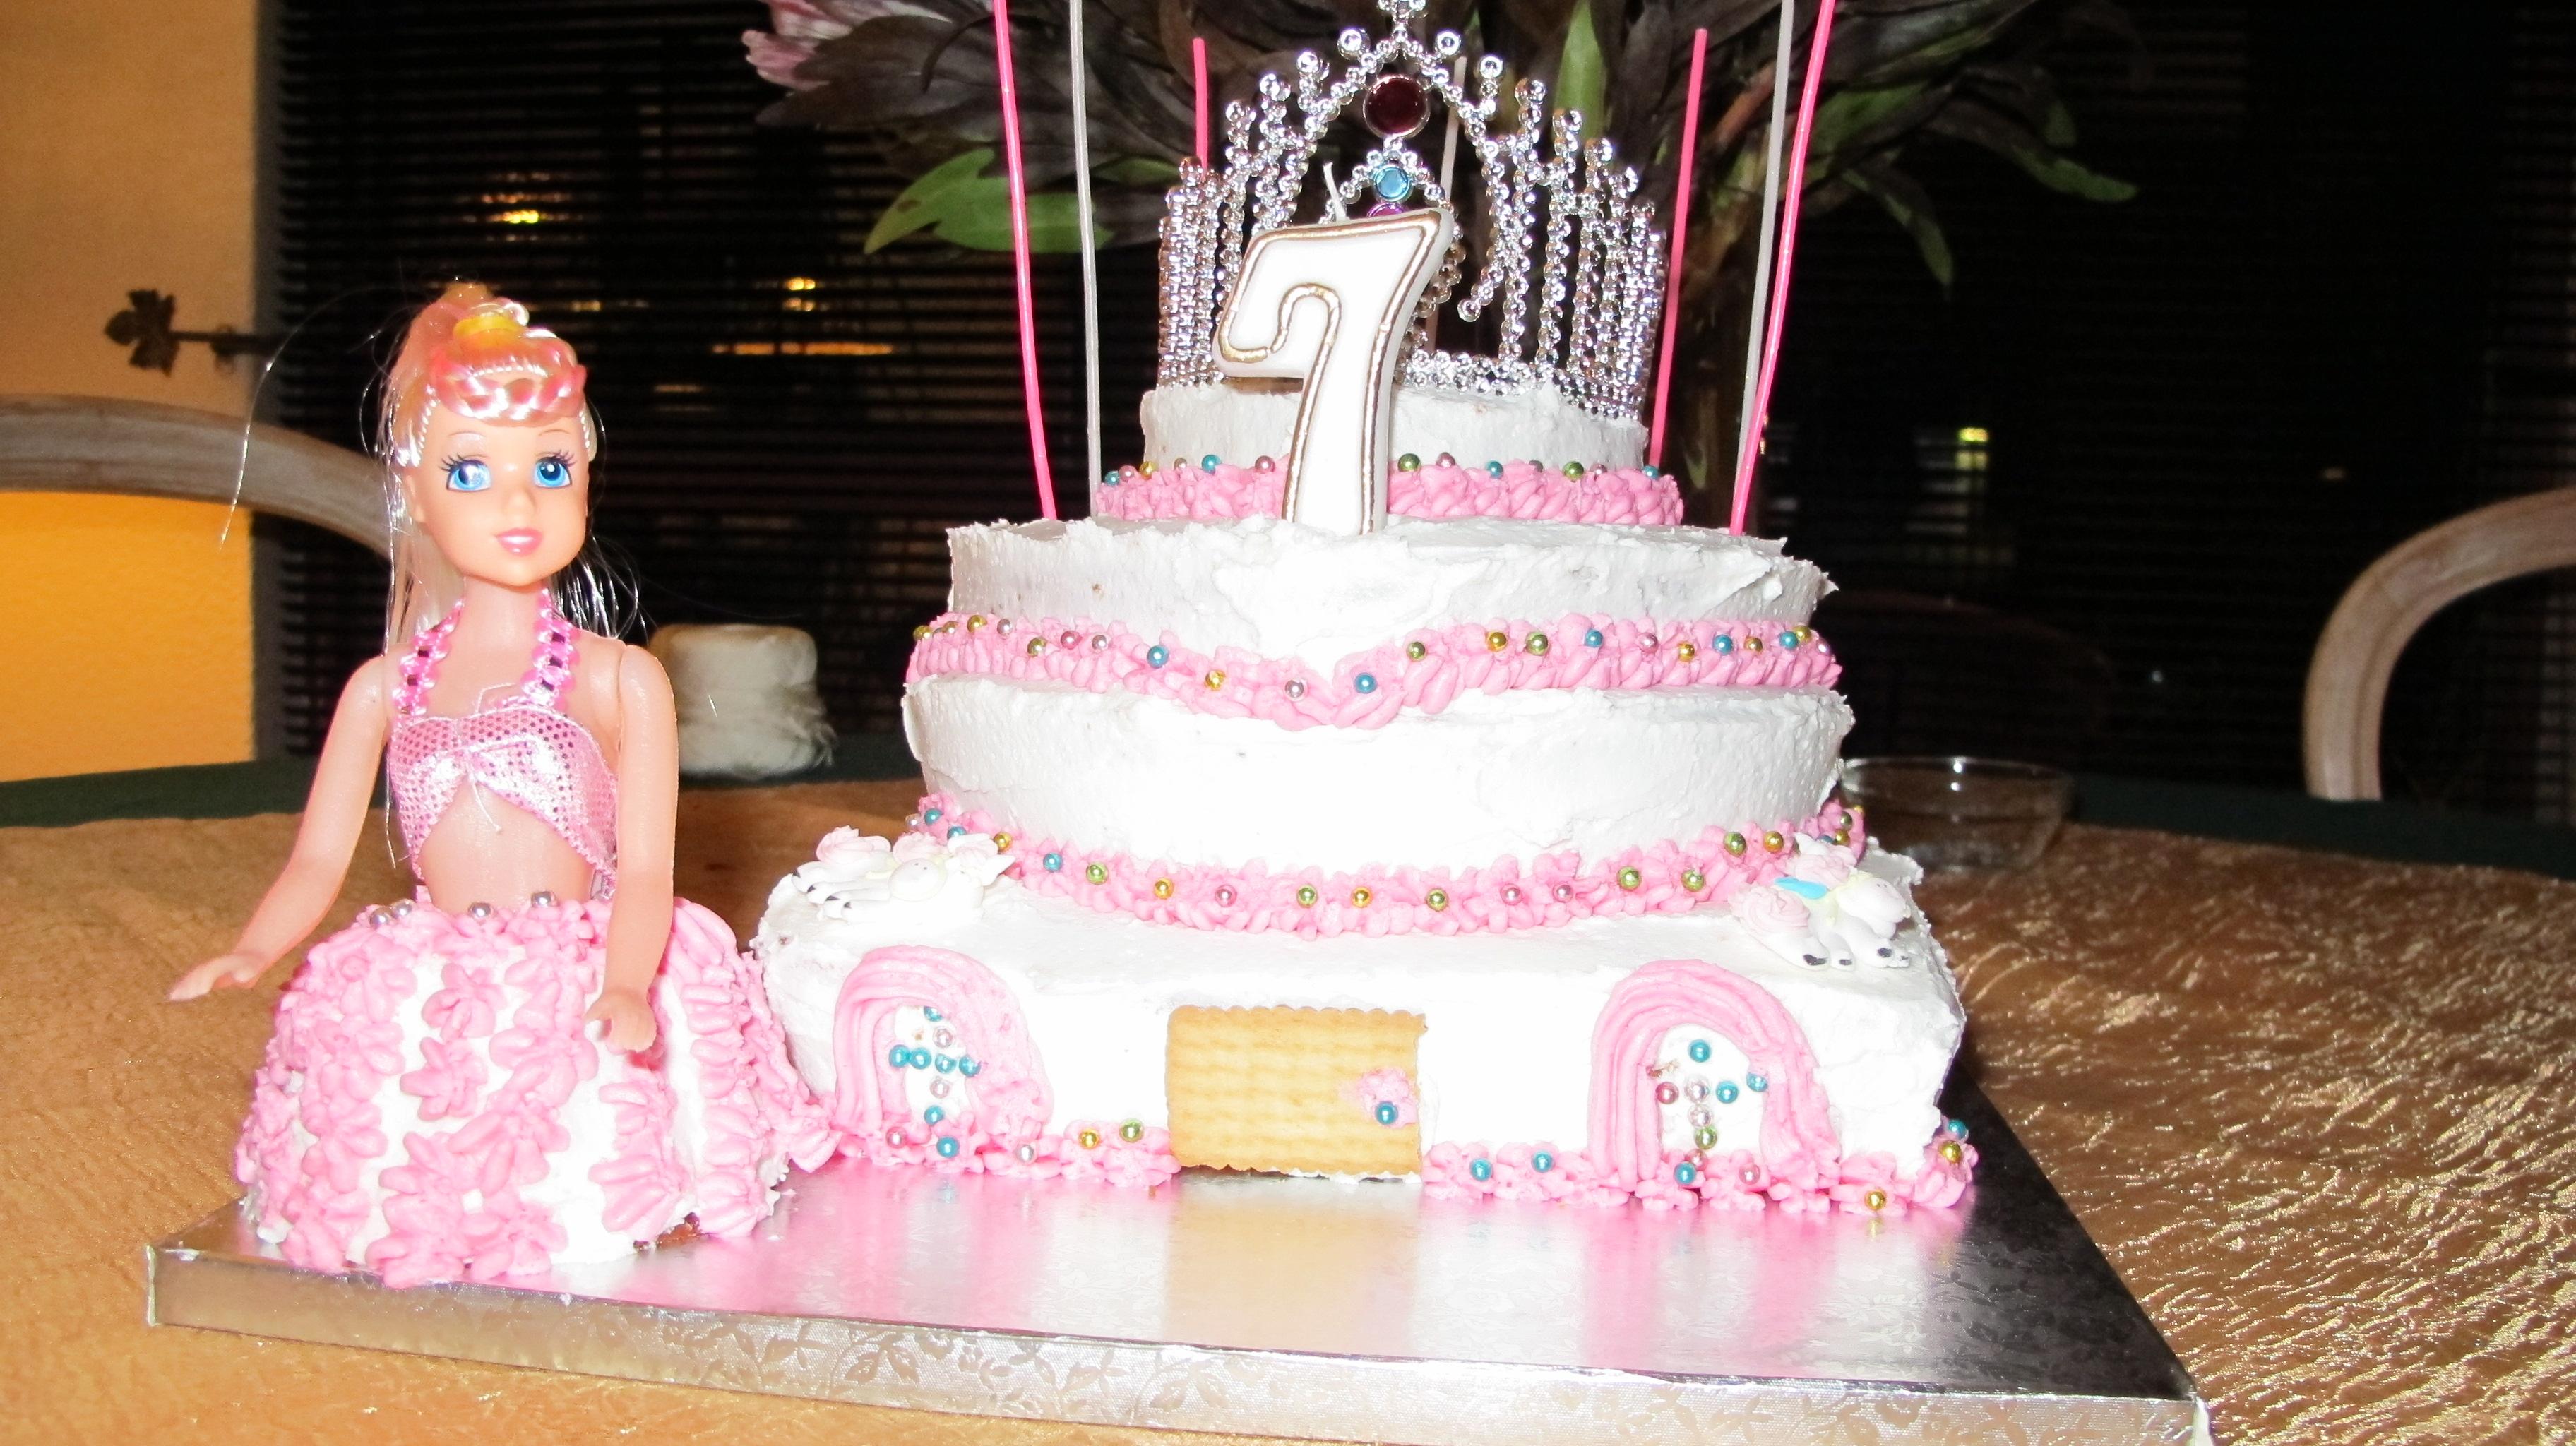 Happy 7th Birthday Princess Cake